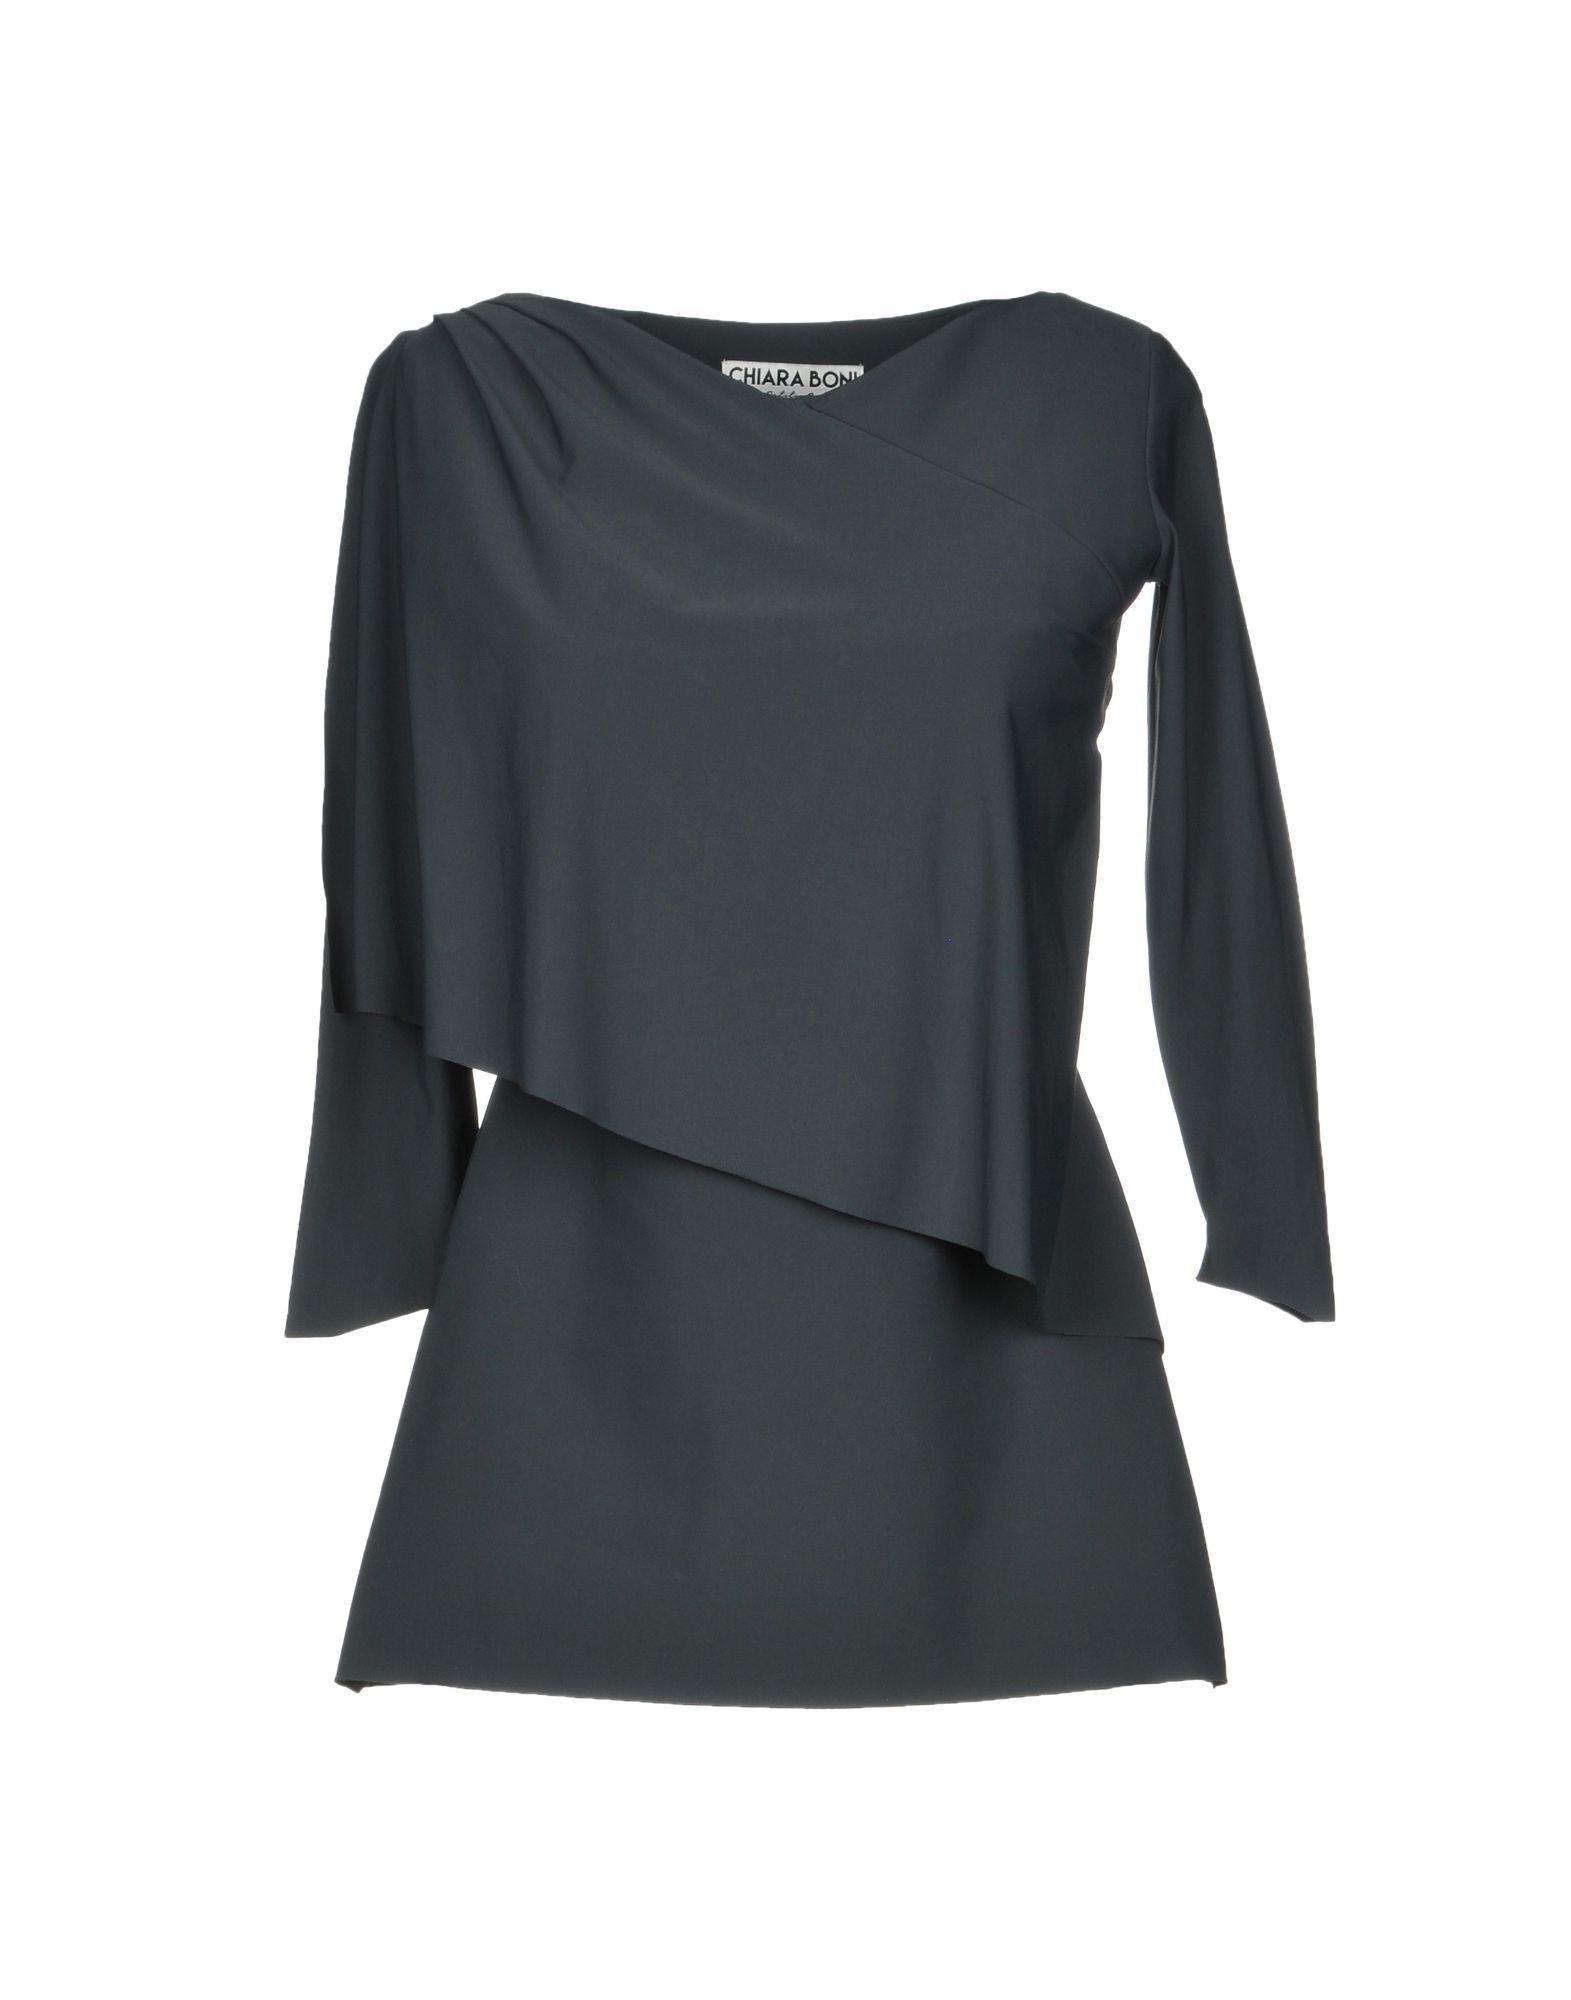 CHIARA BONI LA PETITE ROBE Блузка chiara boni la petite robe футболка